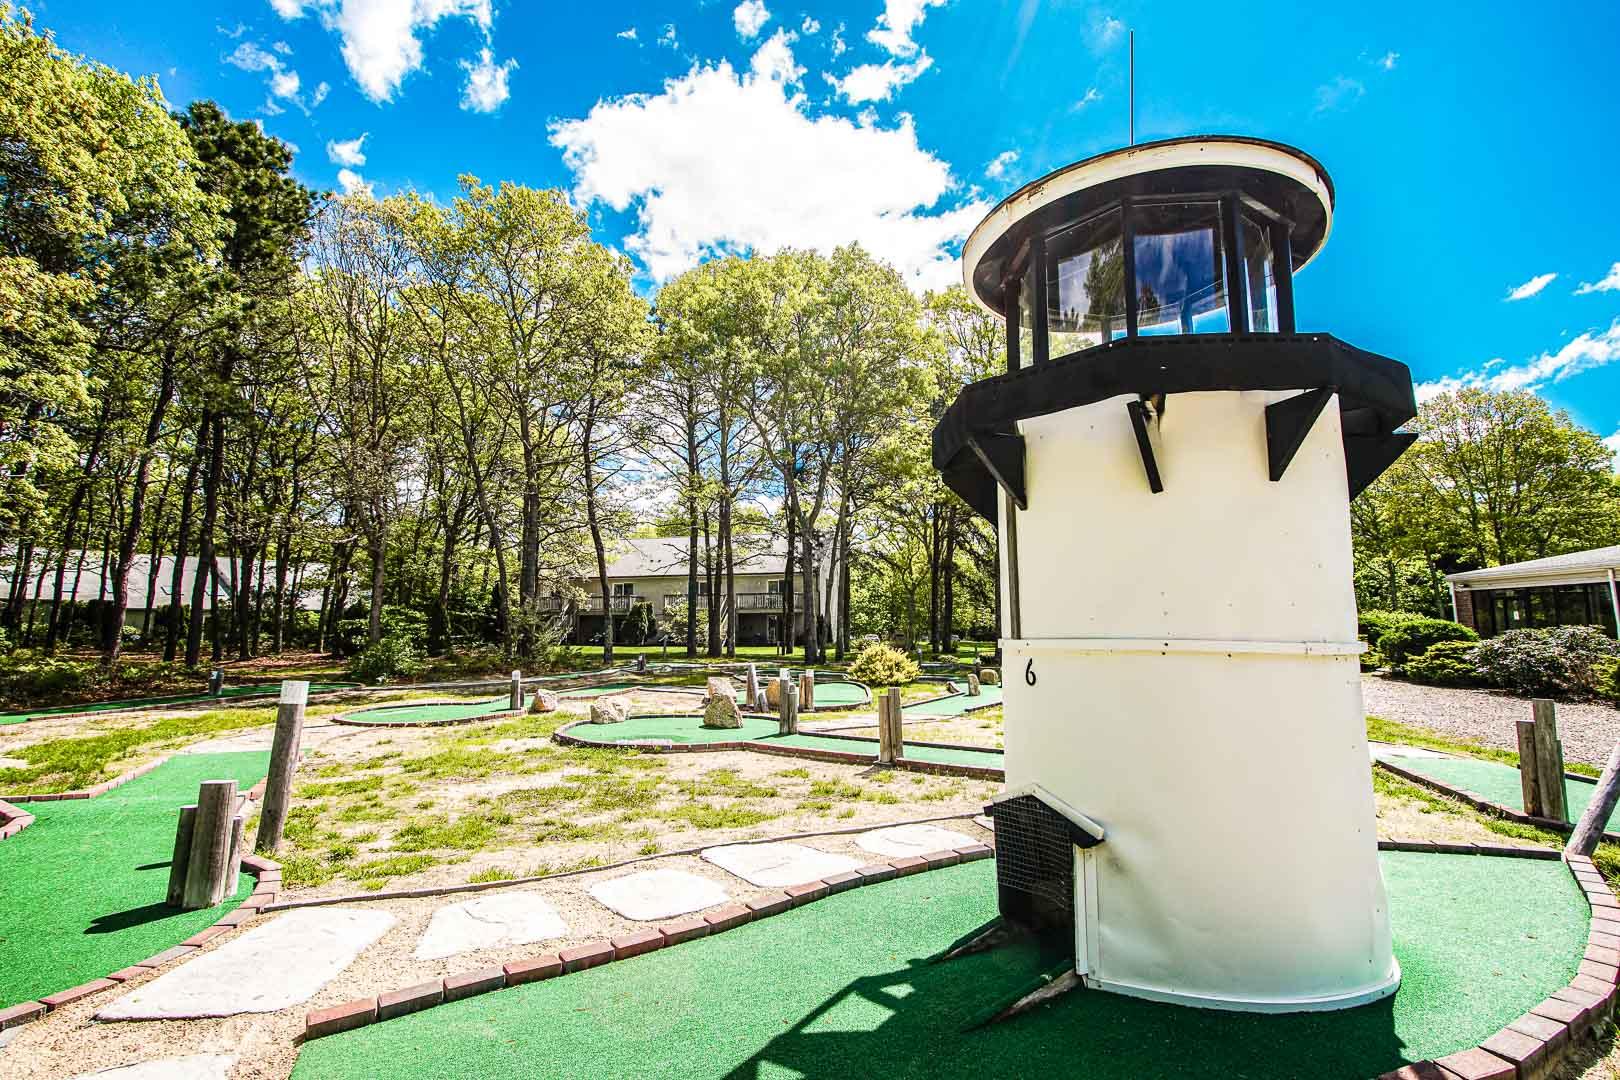 Outside miniature golf amenity at VRI's Sea Mist Resort in Massachusetts.